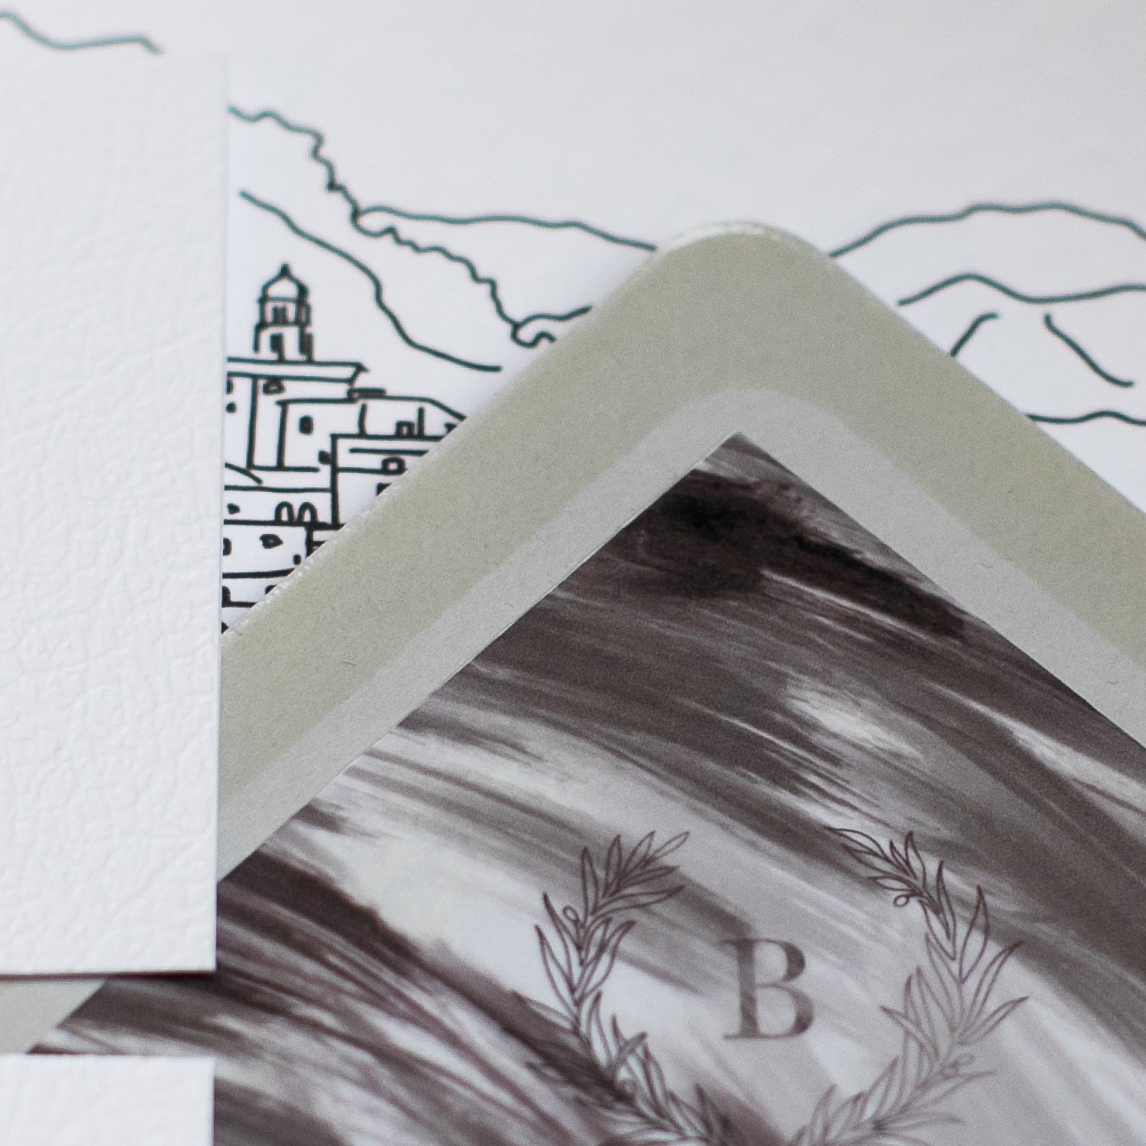 Branded envelope liners